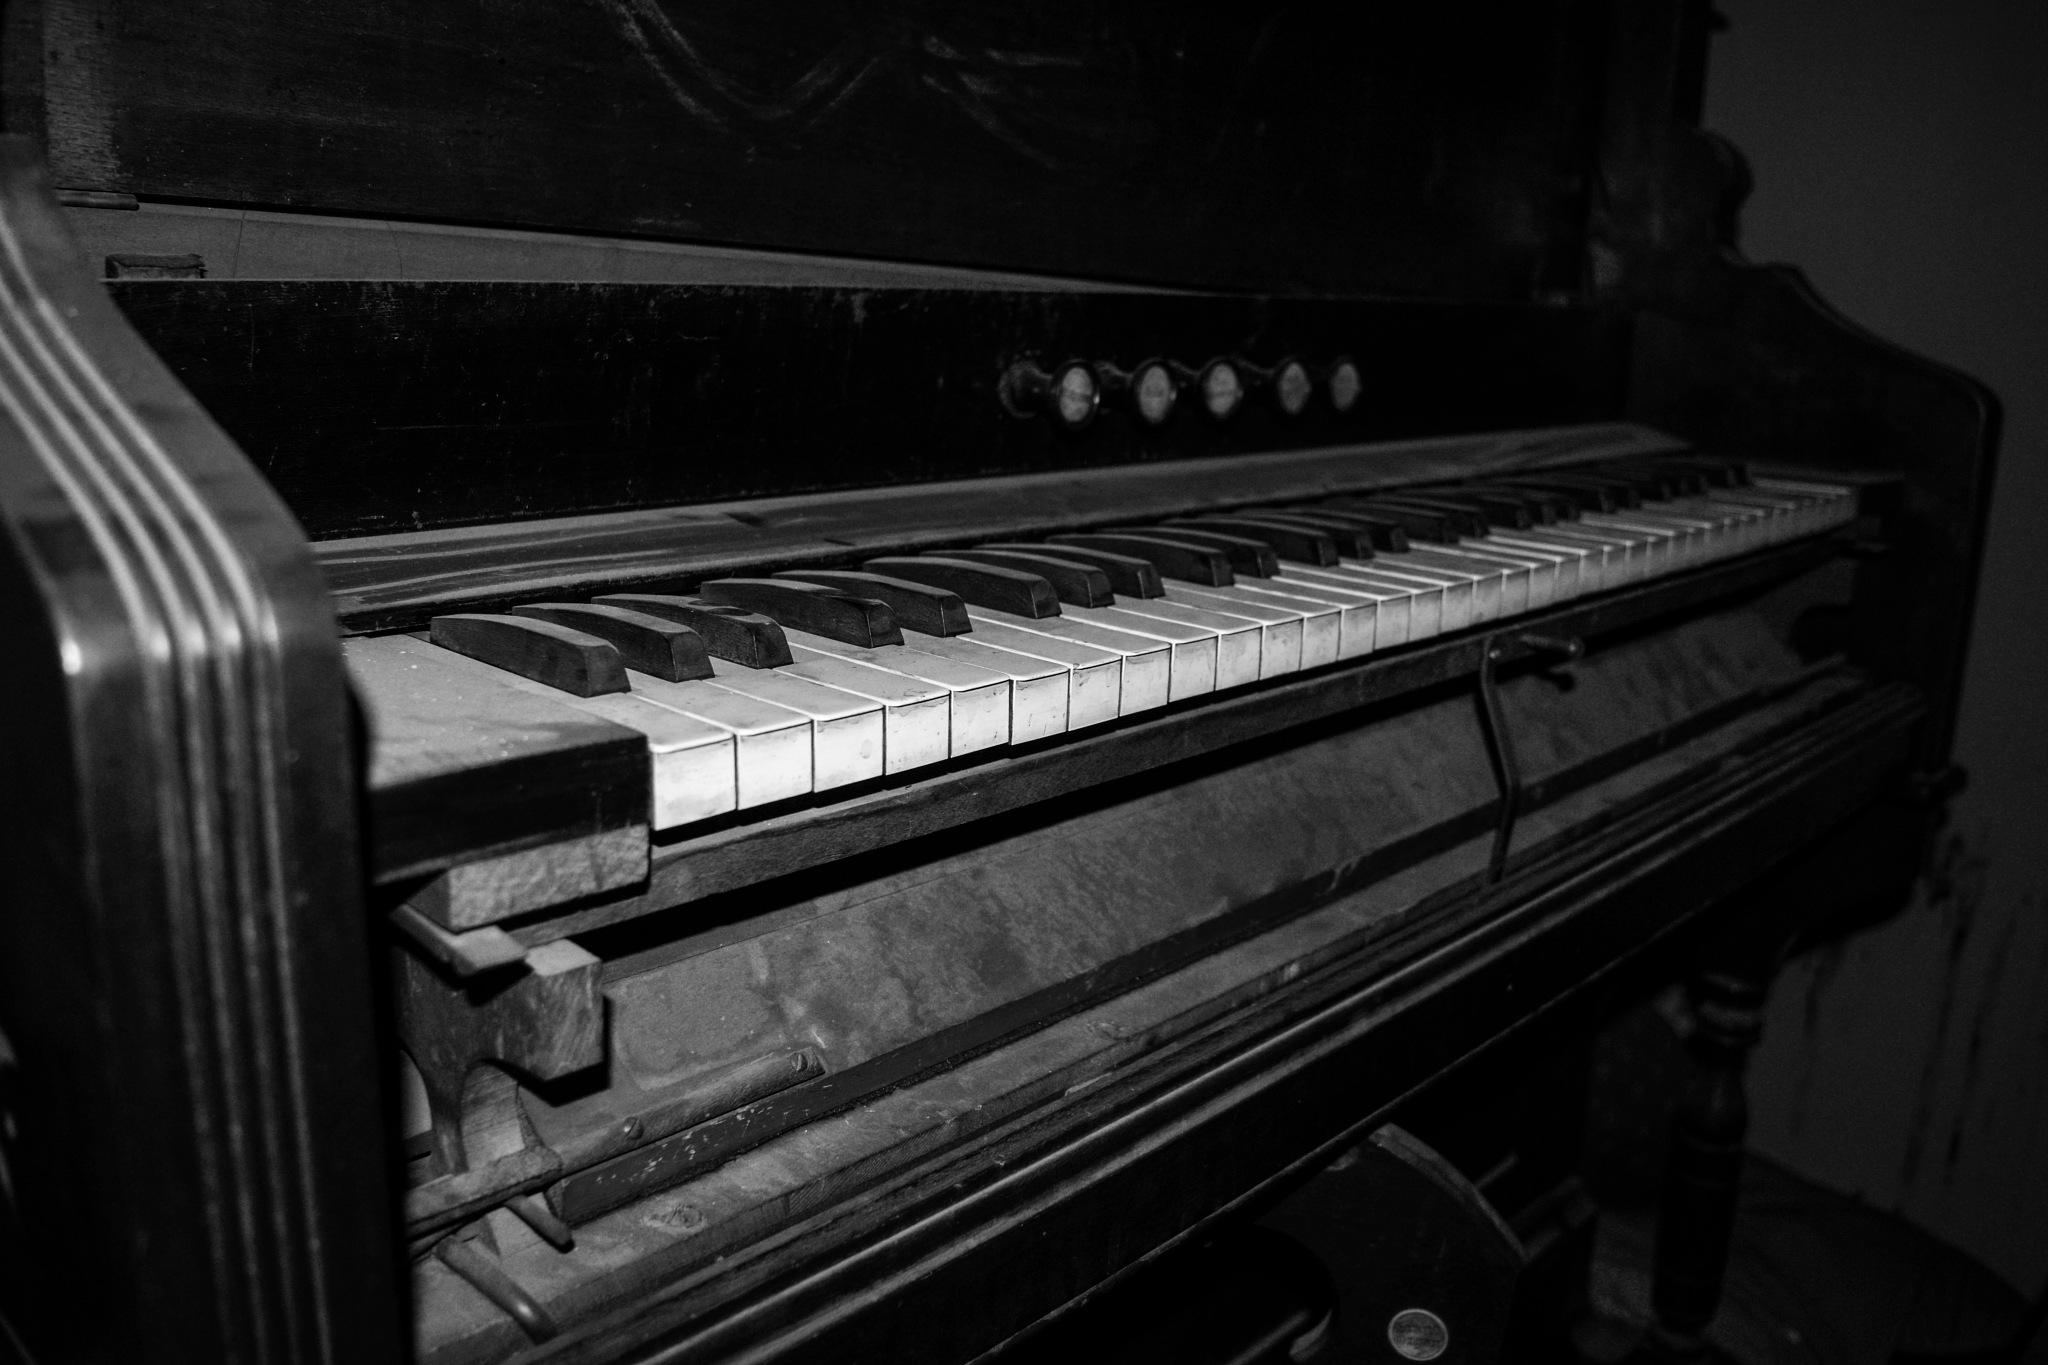 Abandoned ecclesiastical piano by Phsepulveda